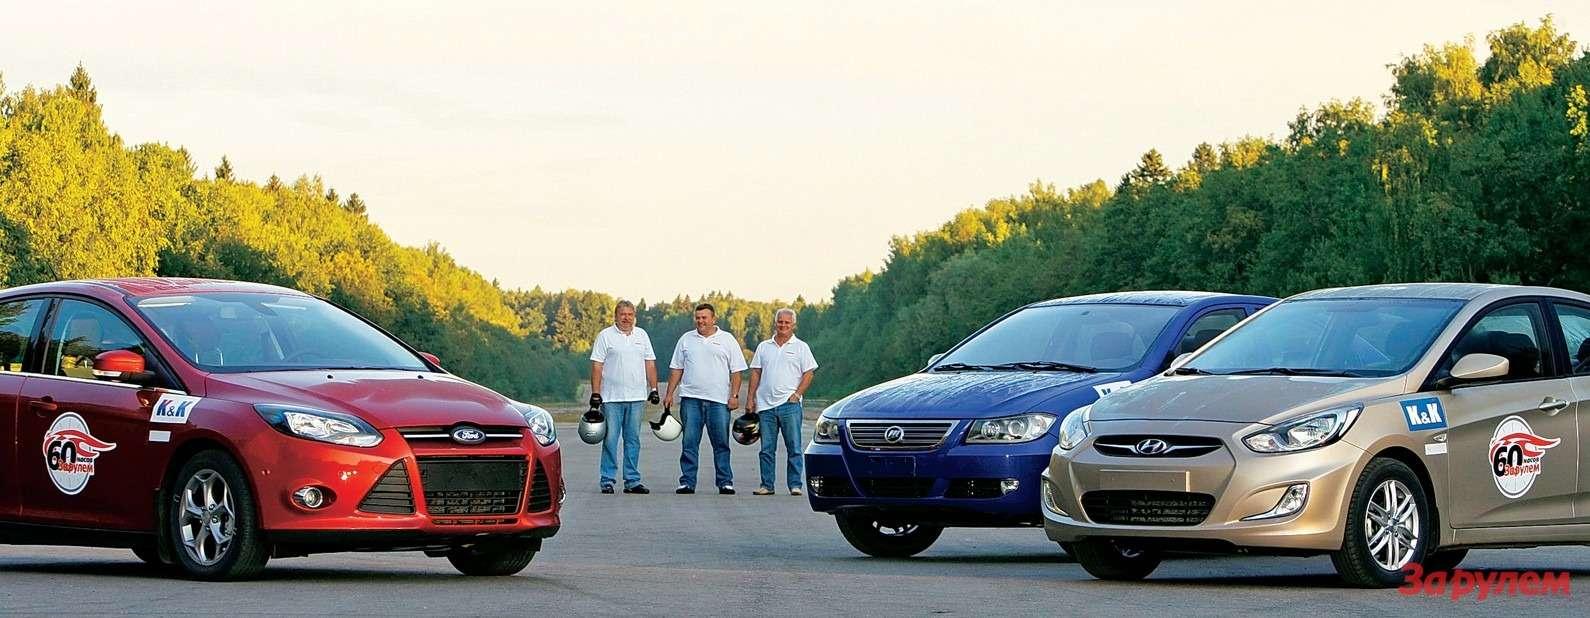 Ford Focus, Hyundai Solaris, Lifan Solano